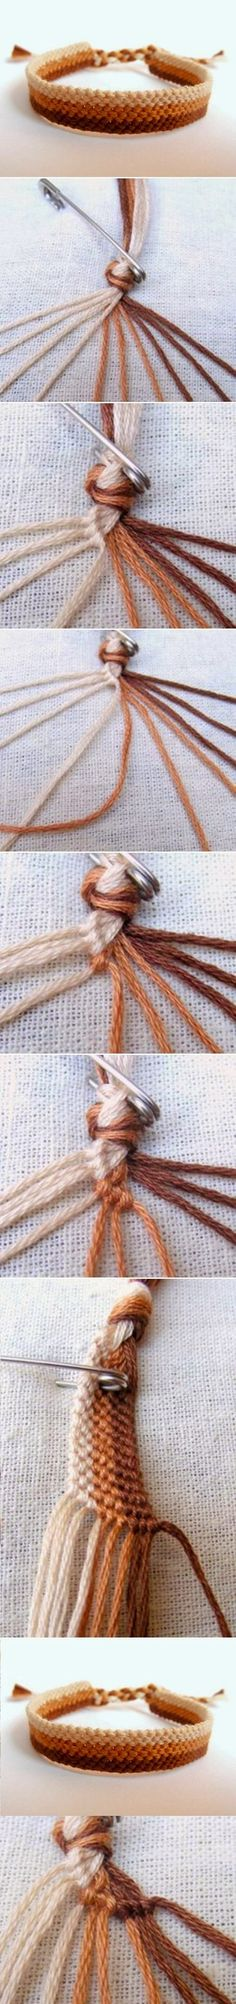 Diy easy weave bracelet diy crafts tutorials diy by bleu Diy Friendship Bracelets Patterns, Diy Bracelets Easy, Bracelet Crafts, Woven Bracelets, Jewelry Crafts, Crochet Bracelet, Knotted Bracelet, Slap Bracelets, Micro Macrame